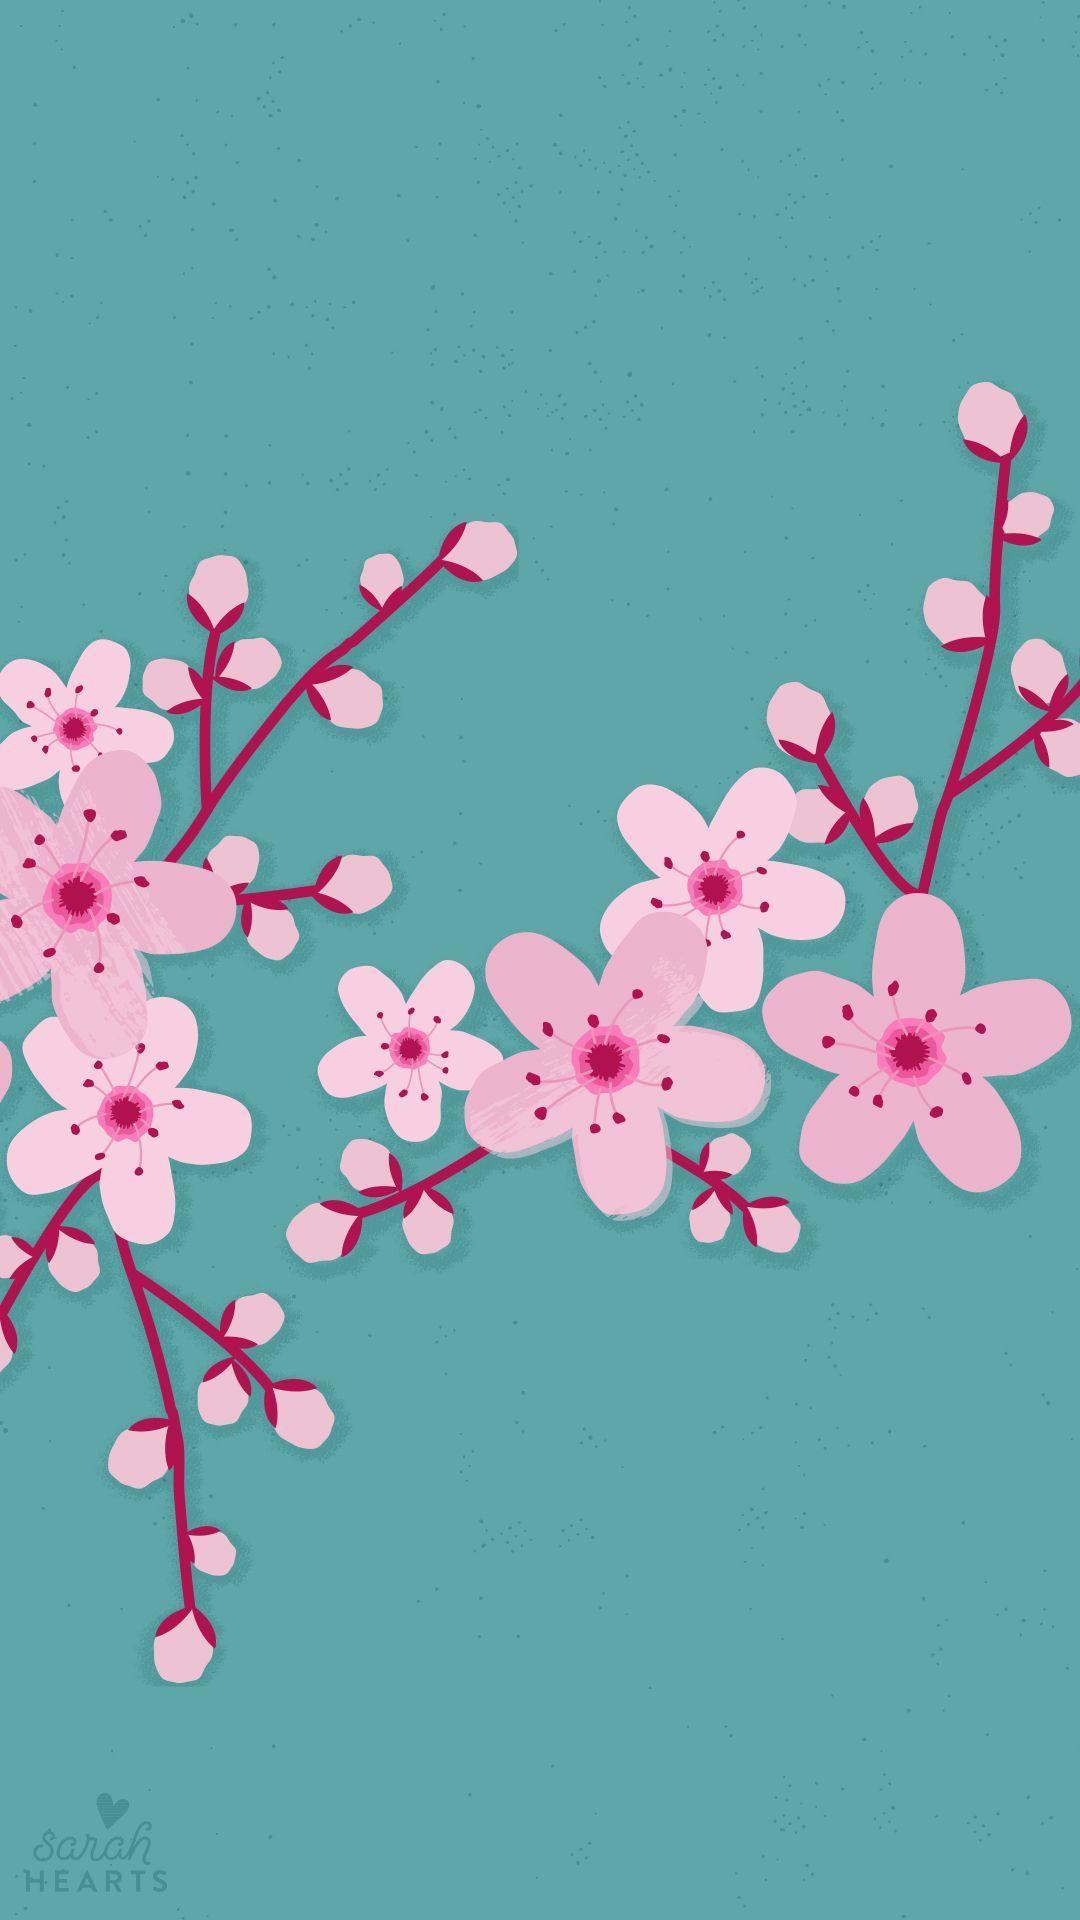 Get Iphone 6 Cherry Blossom Flower Wallpaper Gif